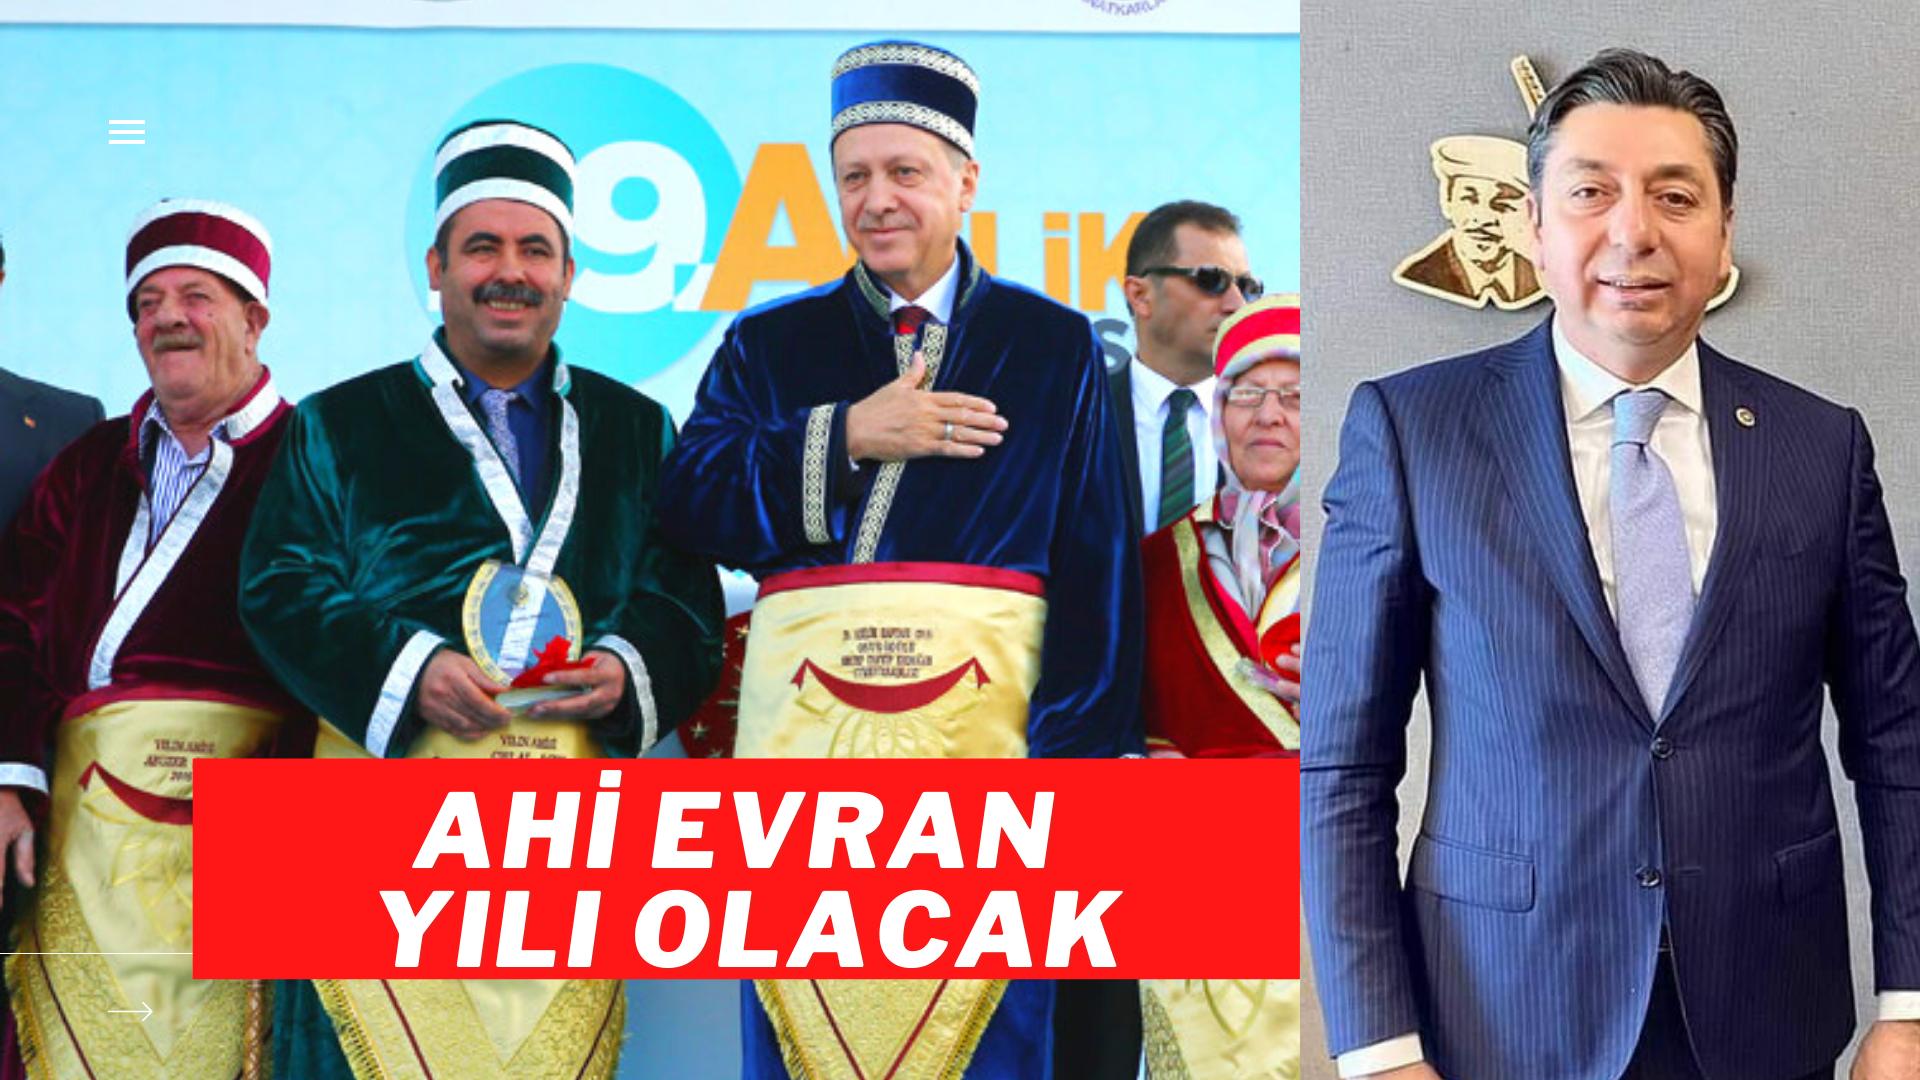 """2021 AHİ EVRAN YILI"""